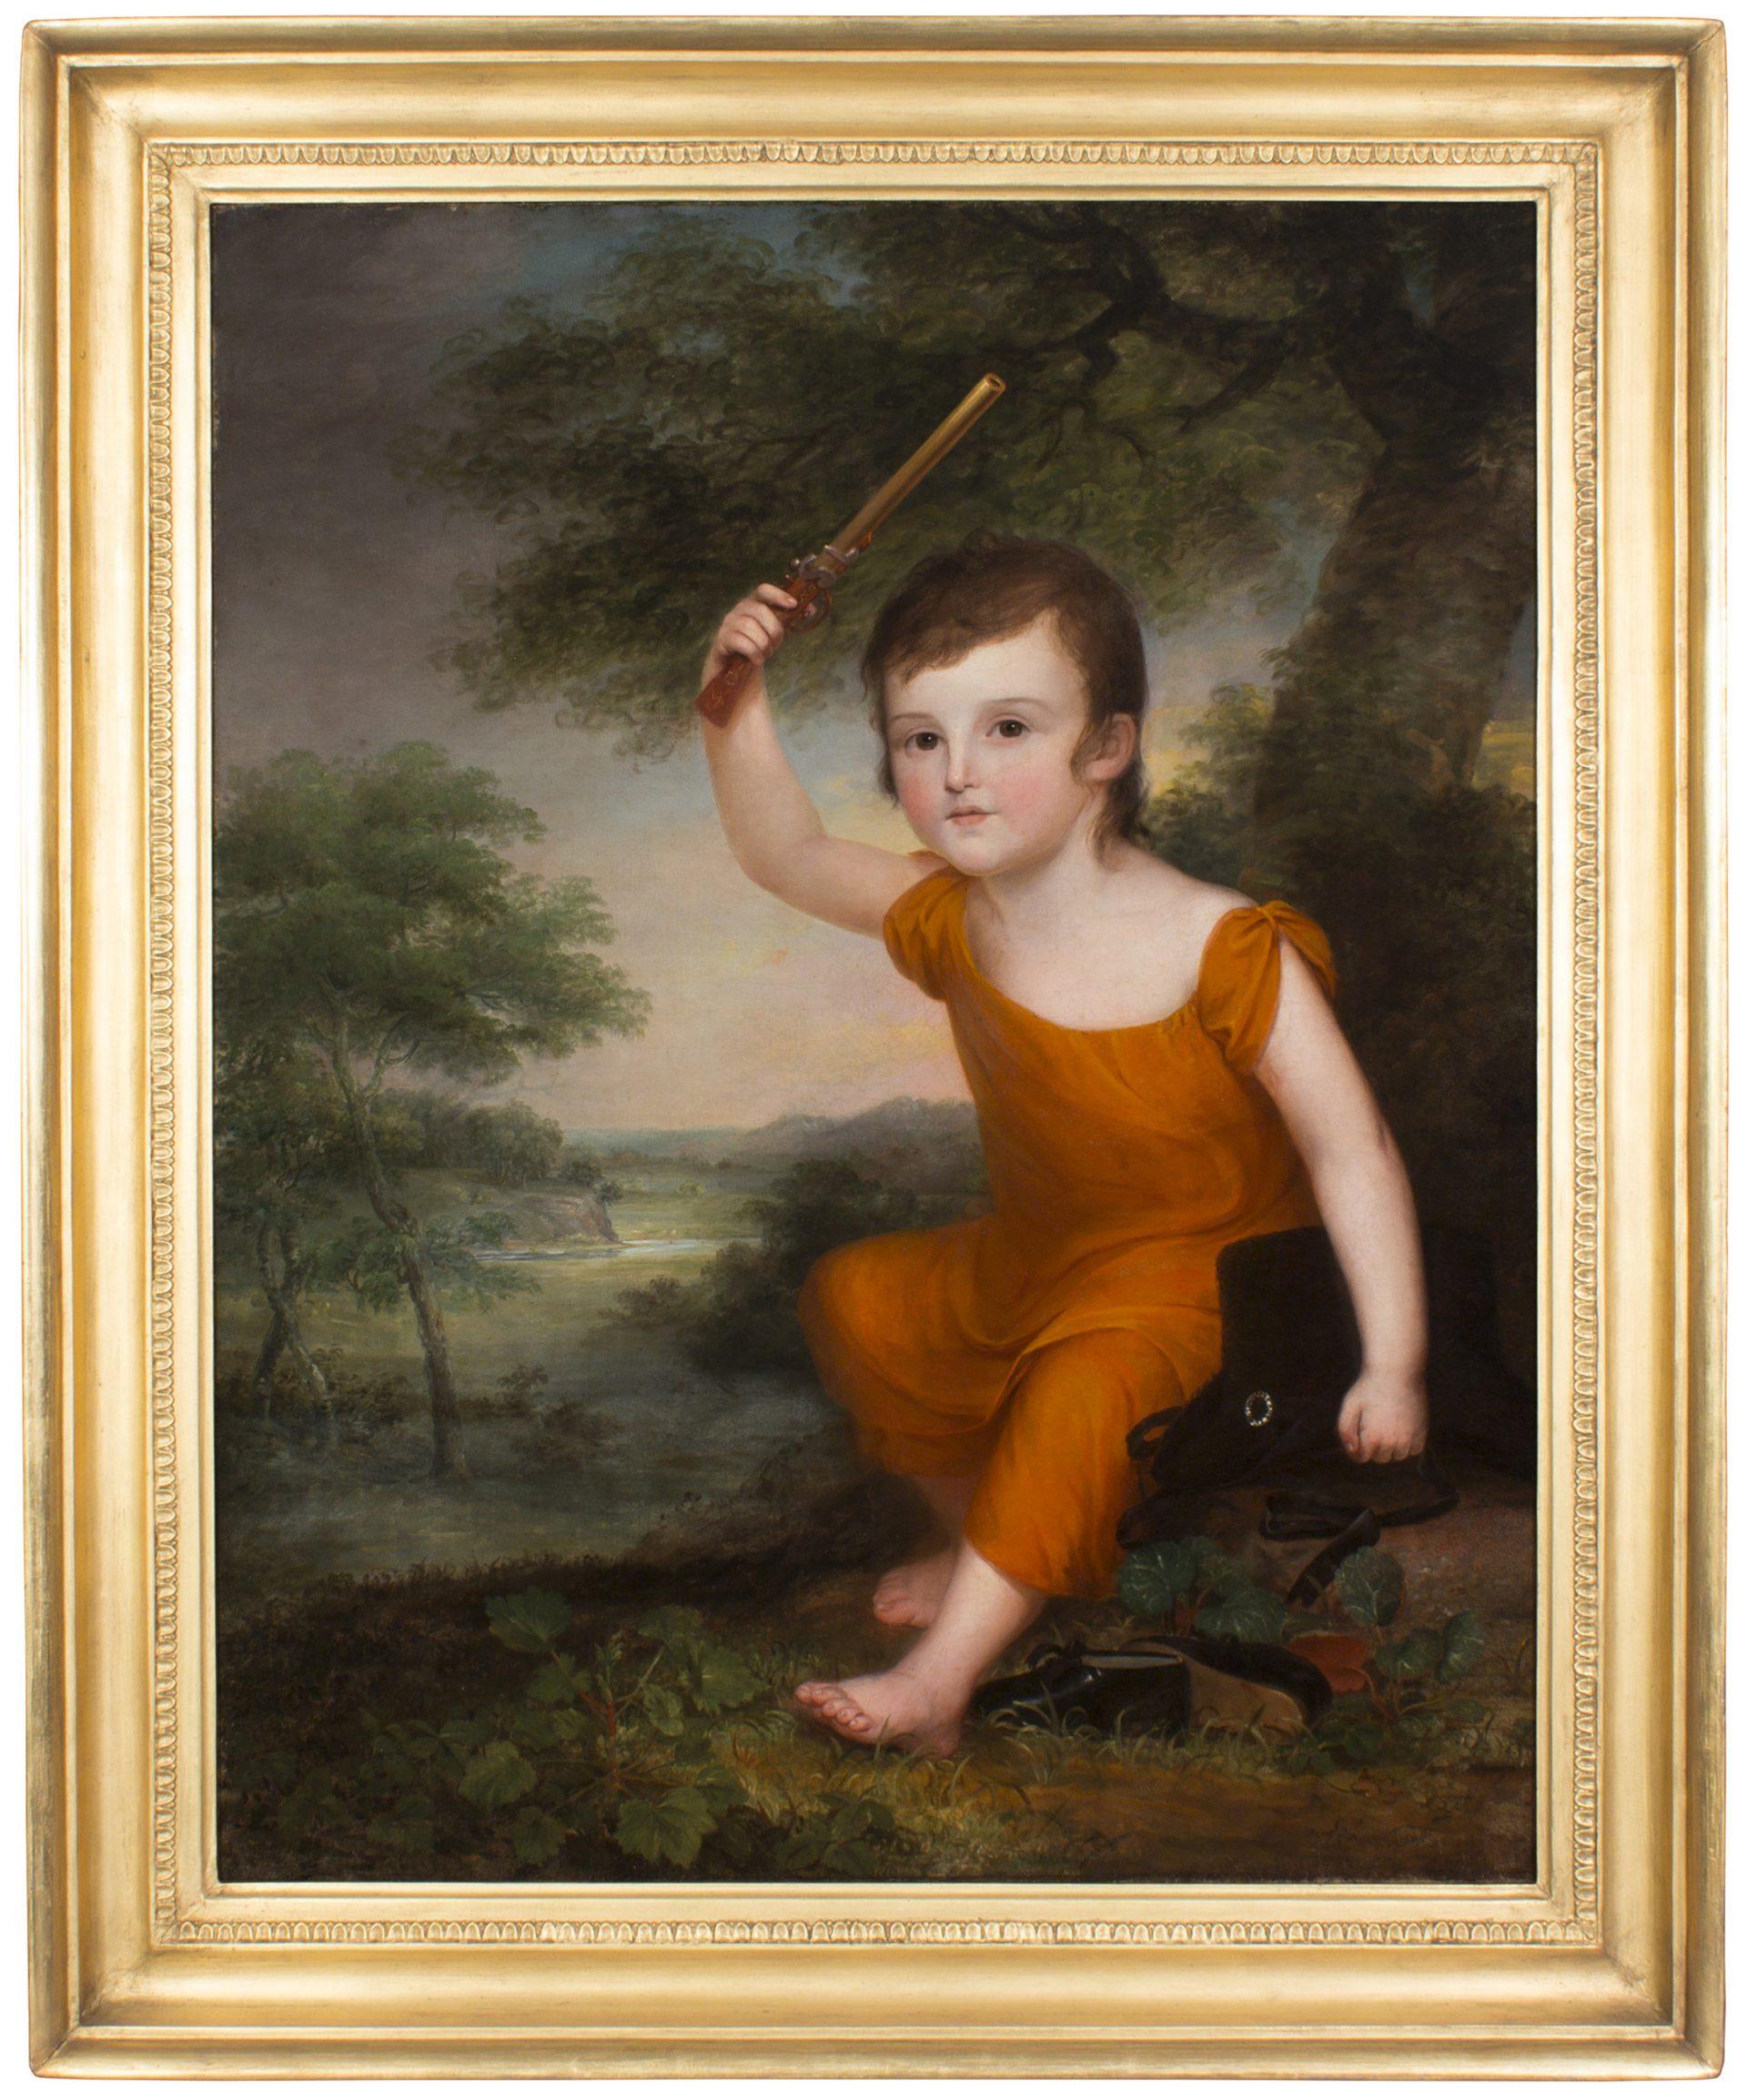 Portrait of John Dunlap, Jr. (1786-1856) FRAMED (James Peale)